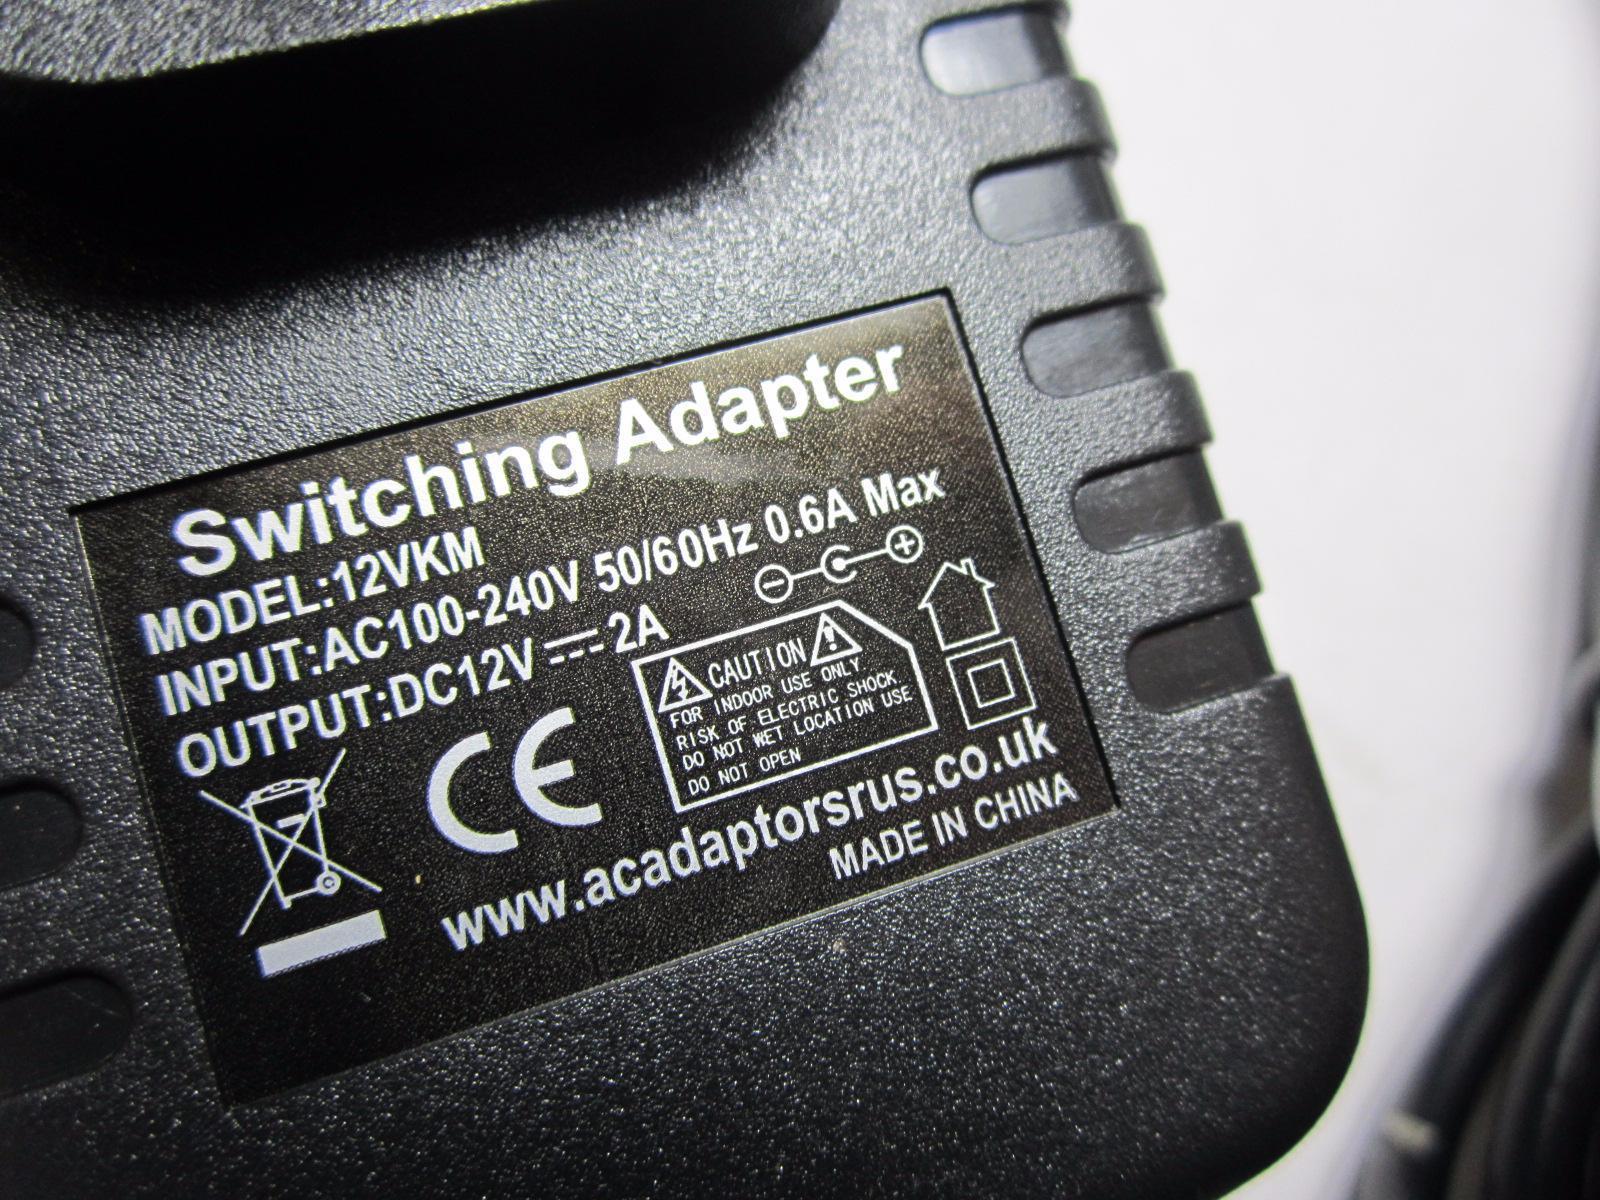 12V Power Supply 4 Philips PicoPix PPX3610 100 Lumens Multimedia Pocket Projector